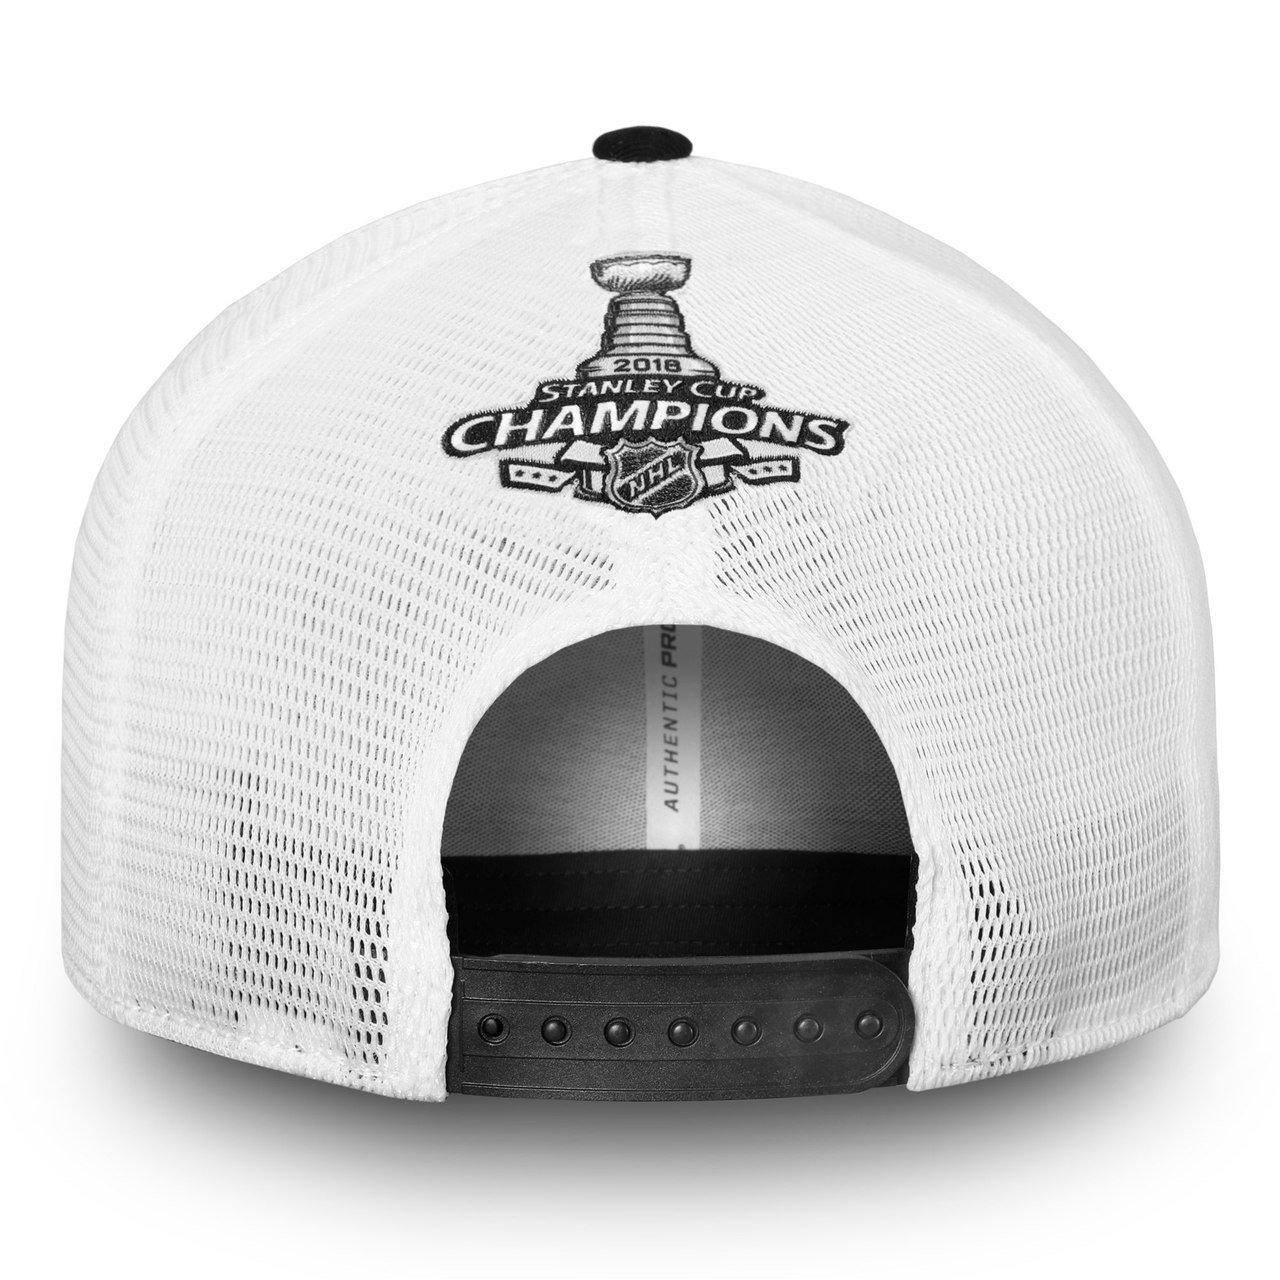 84ca654e583a9d Amazon.com : Football Fanatics Washington Capitals 2018 Stanley Cup  Champions Locker Room Trucker Snapback Hat : Clothing